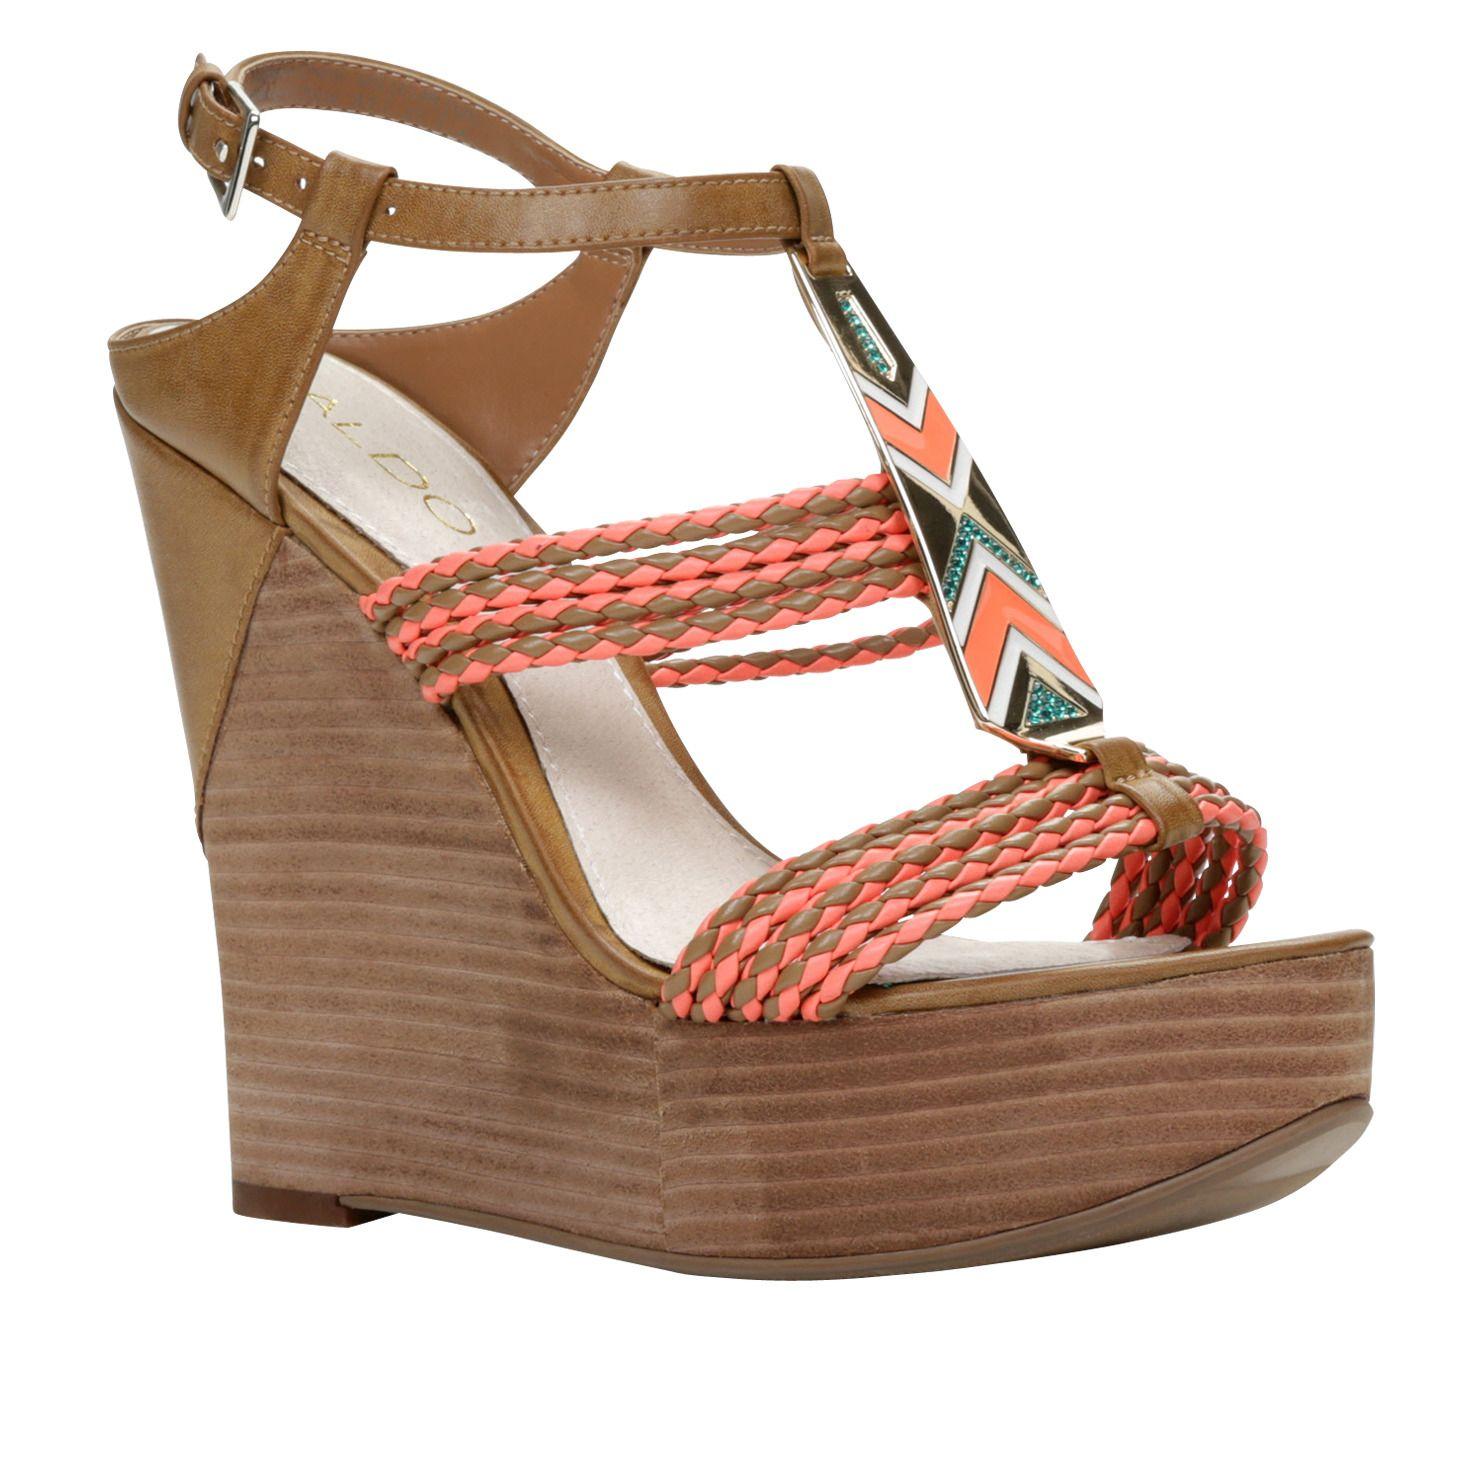 GWEASIEN - women's wedges sandals for sale at ALDO Shoes.